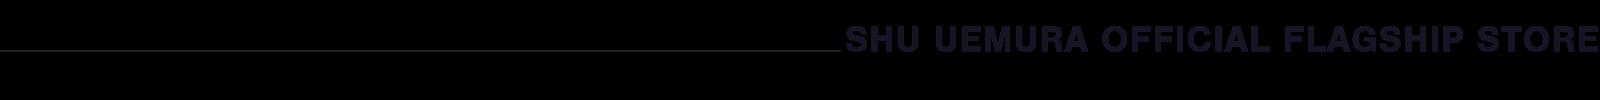 Shu Uemura Flagship Description Banner